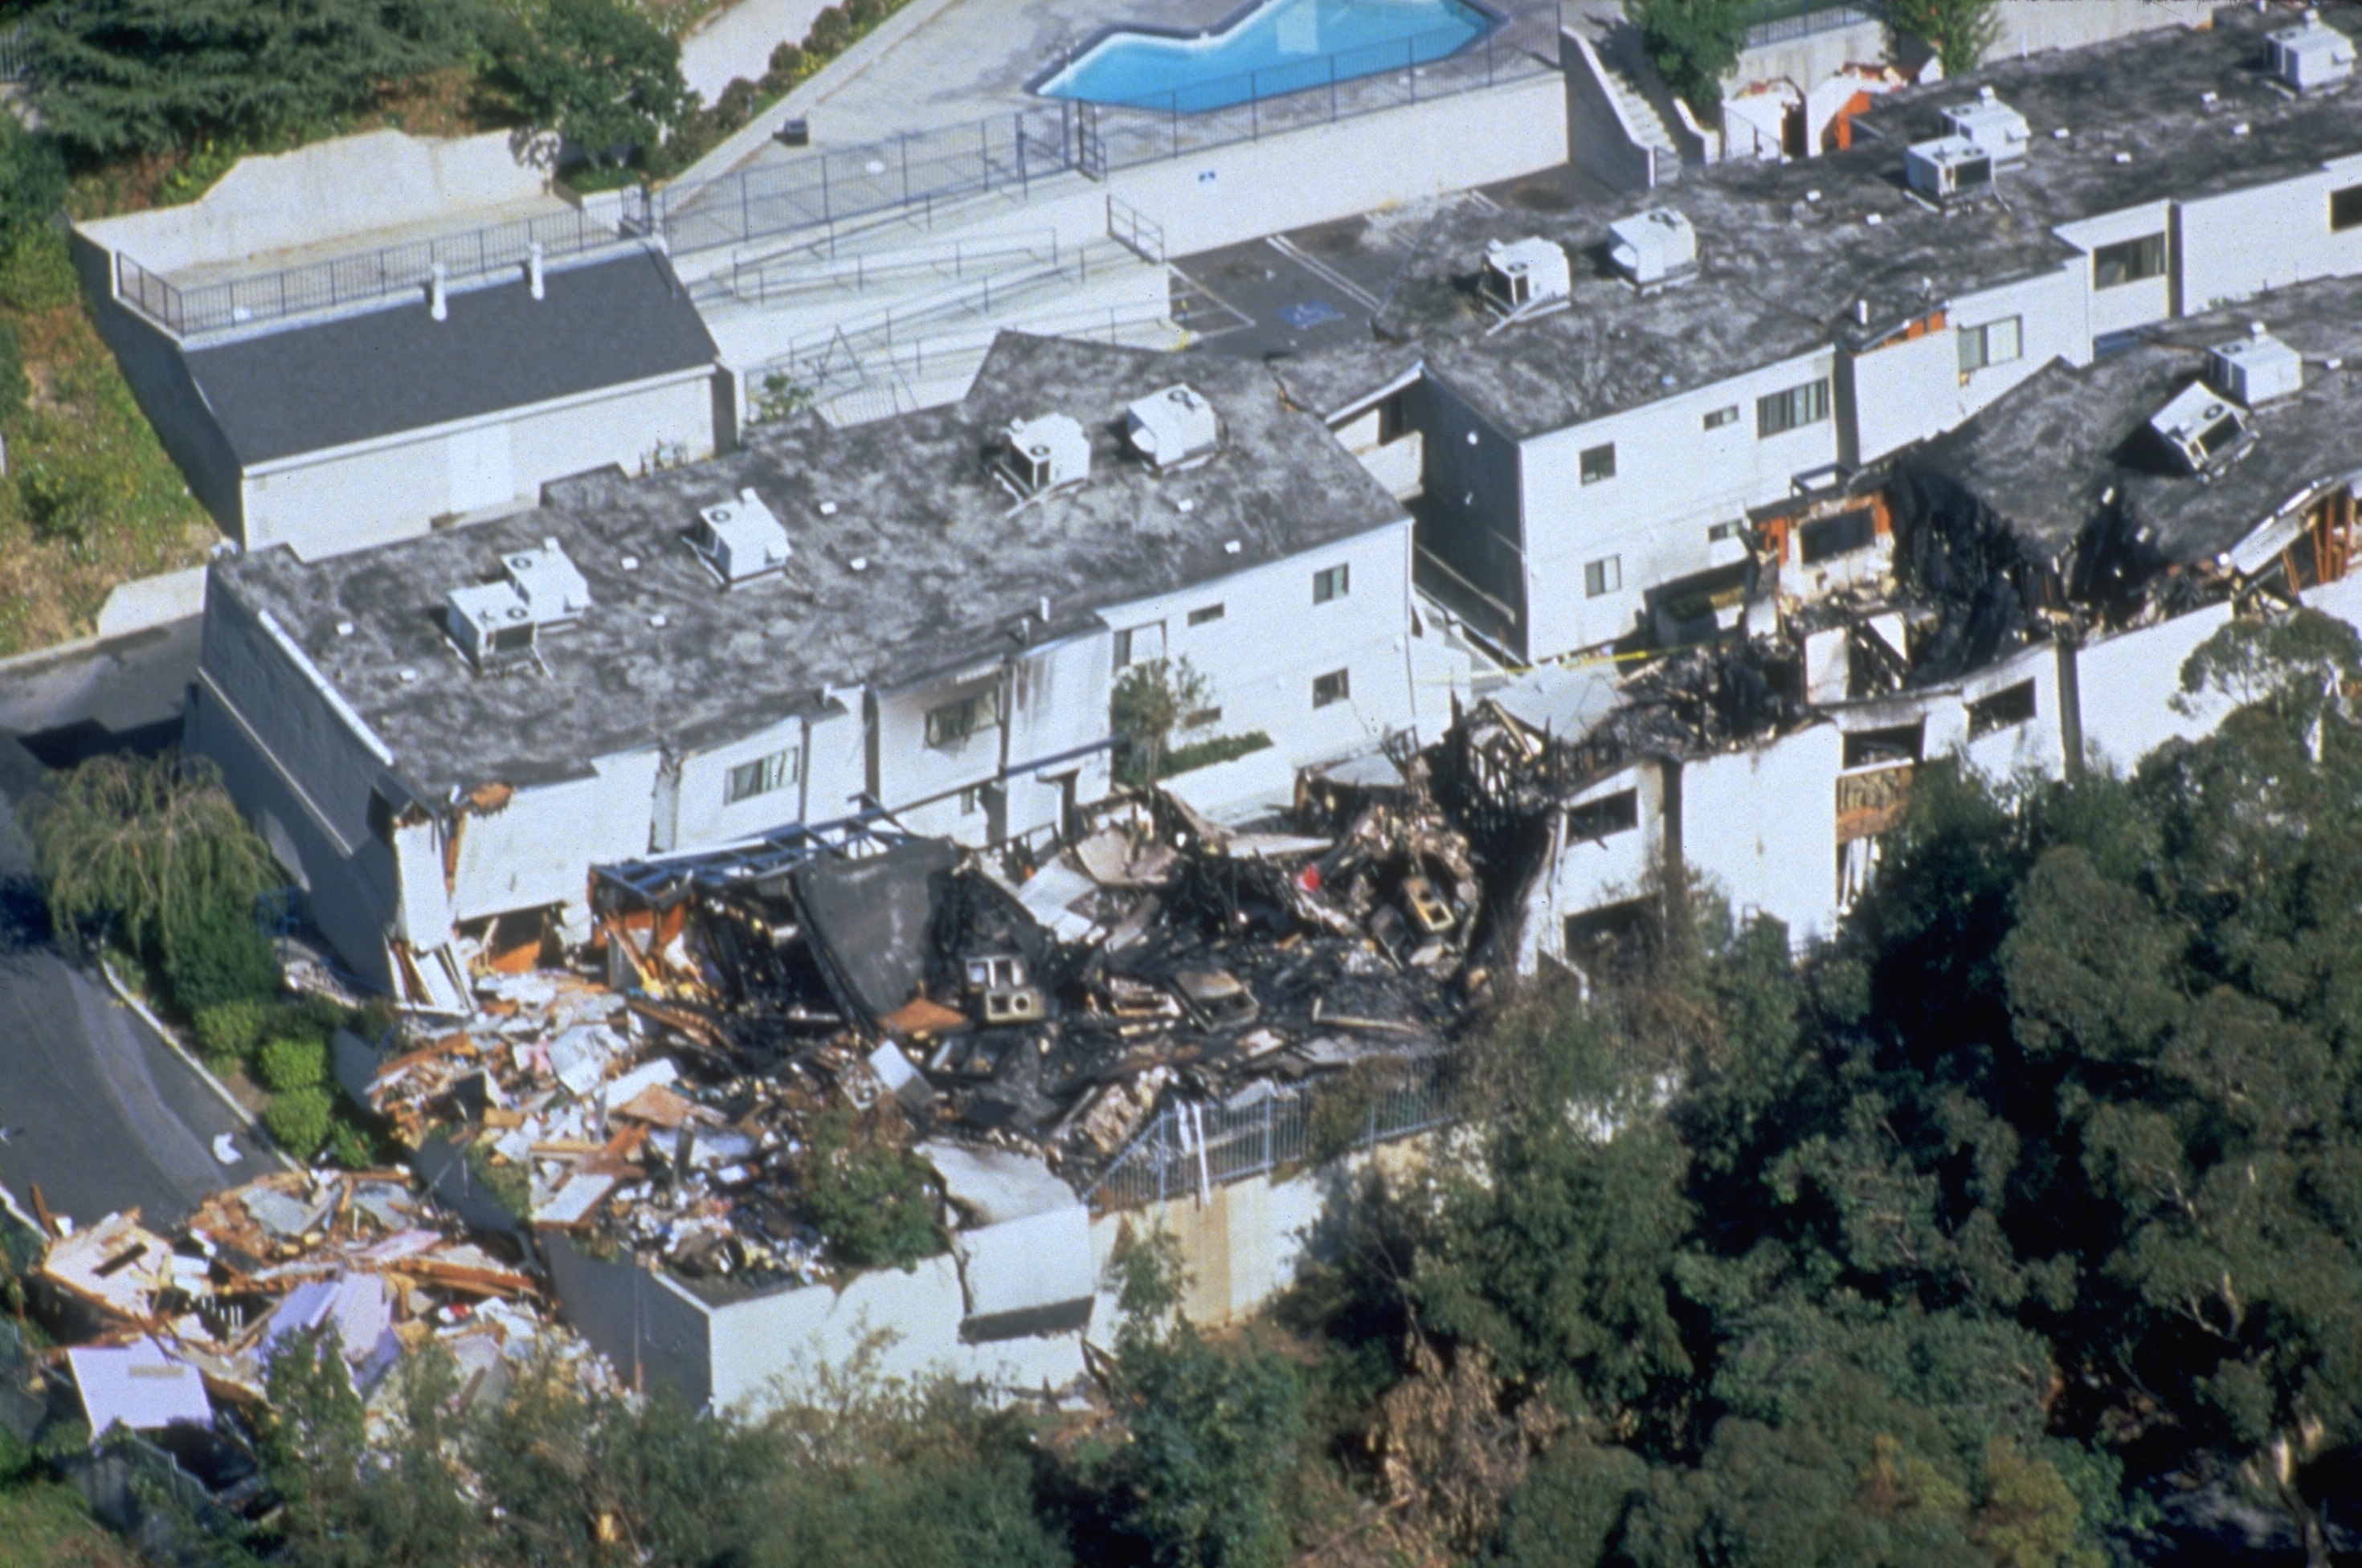 FEMA_-_1681_-_Photograph_by_FEMA_News_Photo_taken_on_01-17-1994_in_California